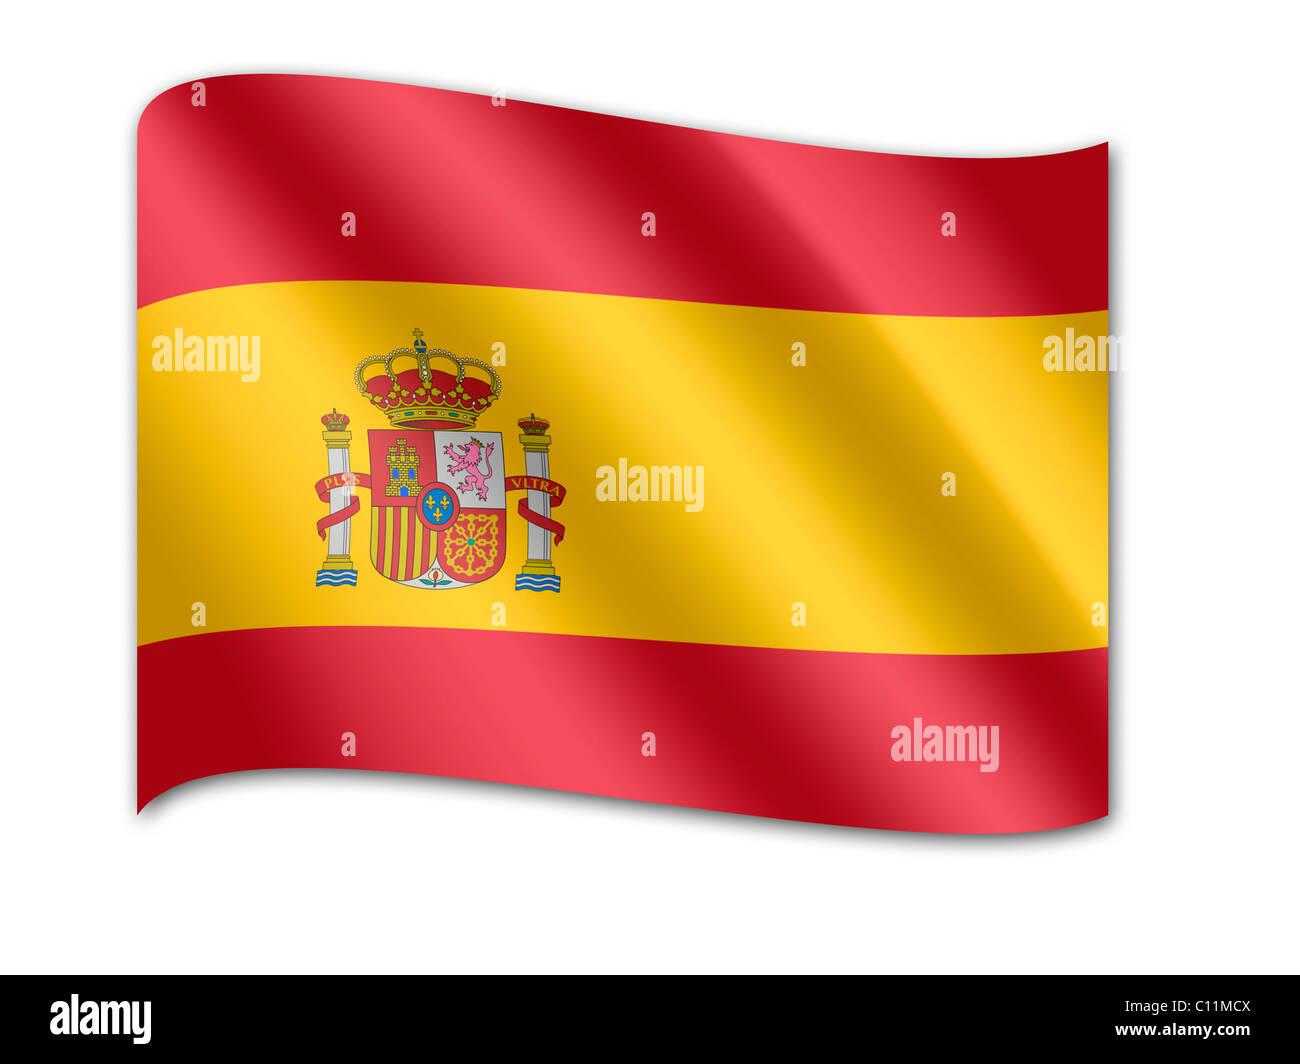 Flag of Spain - Stock Image